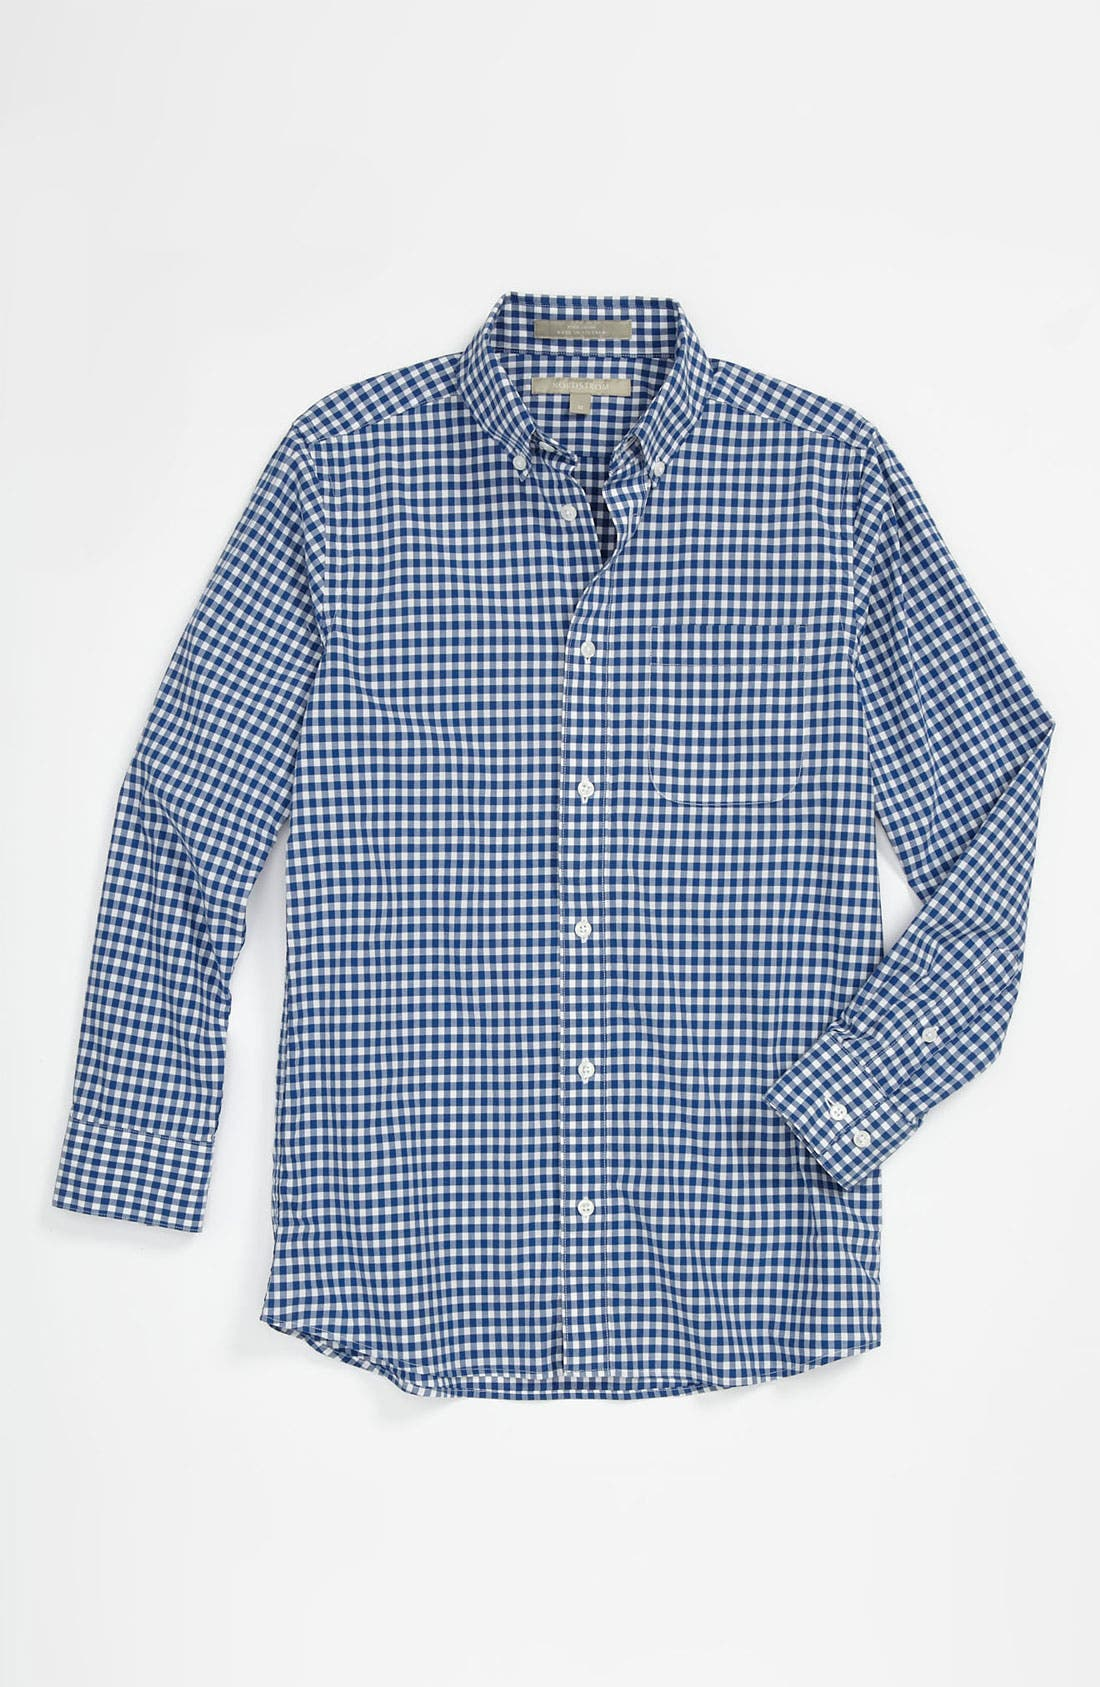 Main Image - Nordstrom Gingham Dress Shirt (Big Boys)